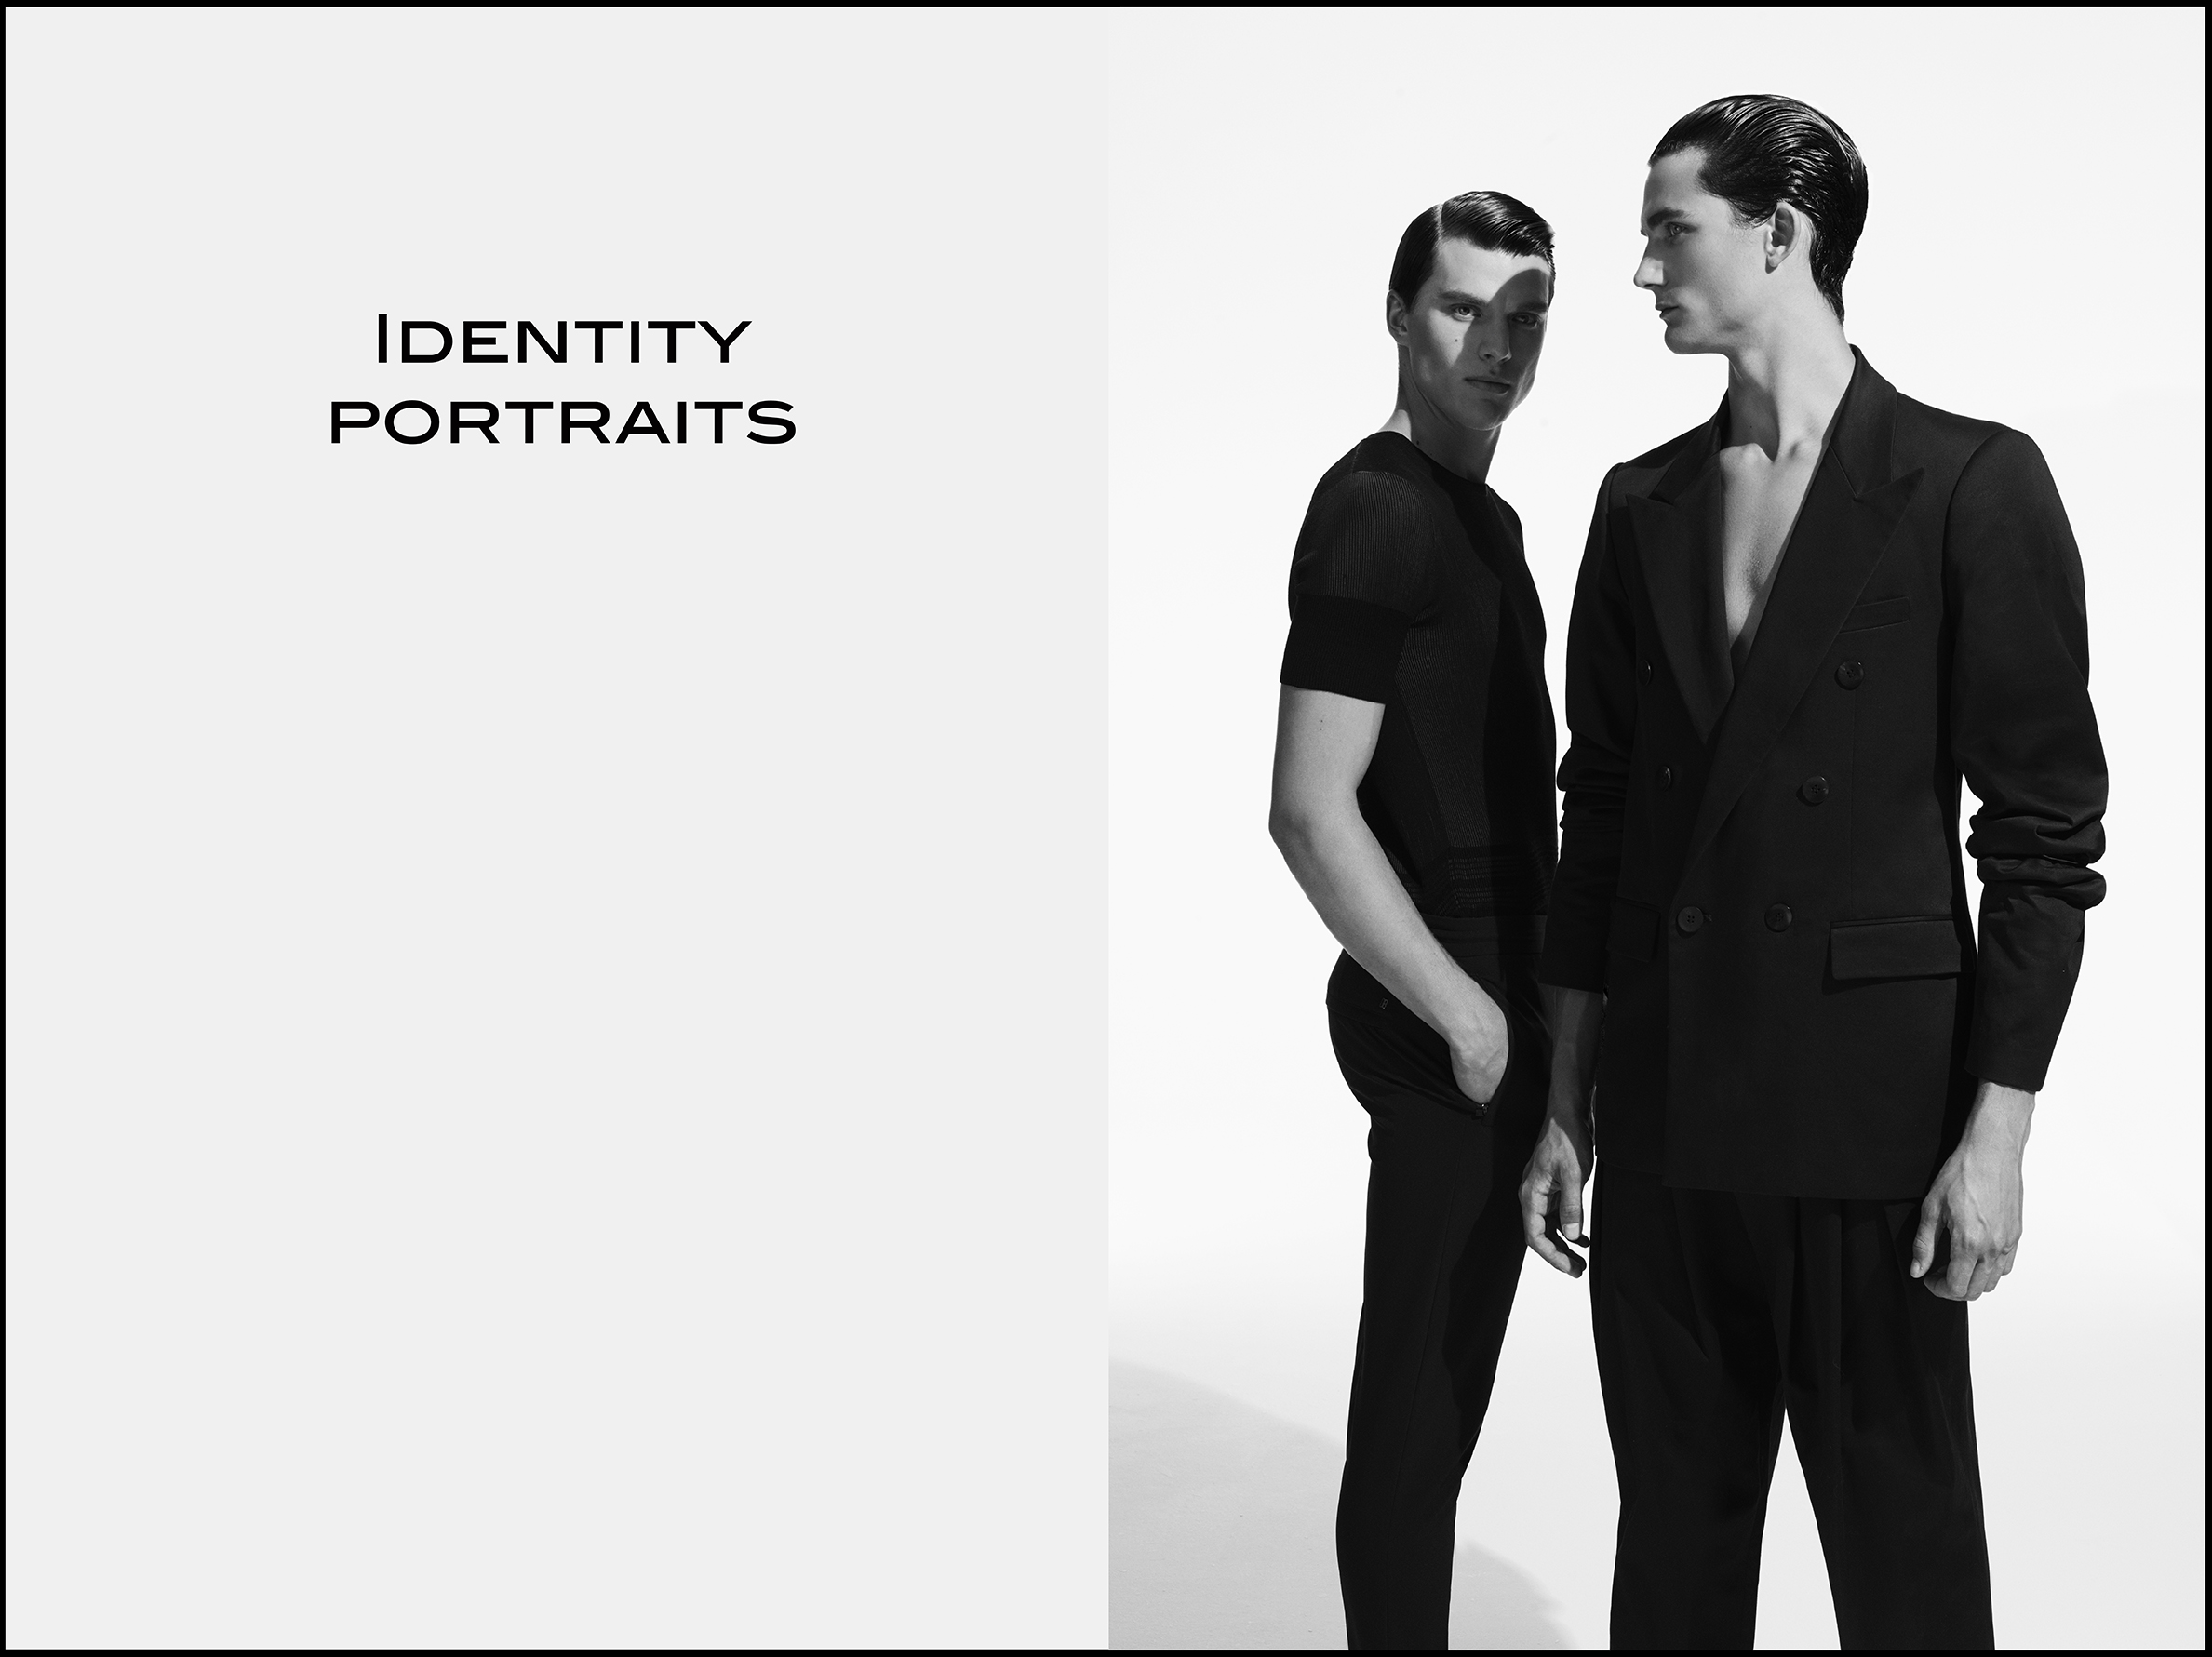 Identity Portraits